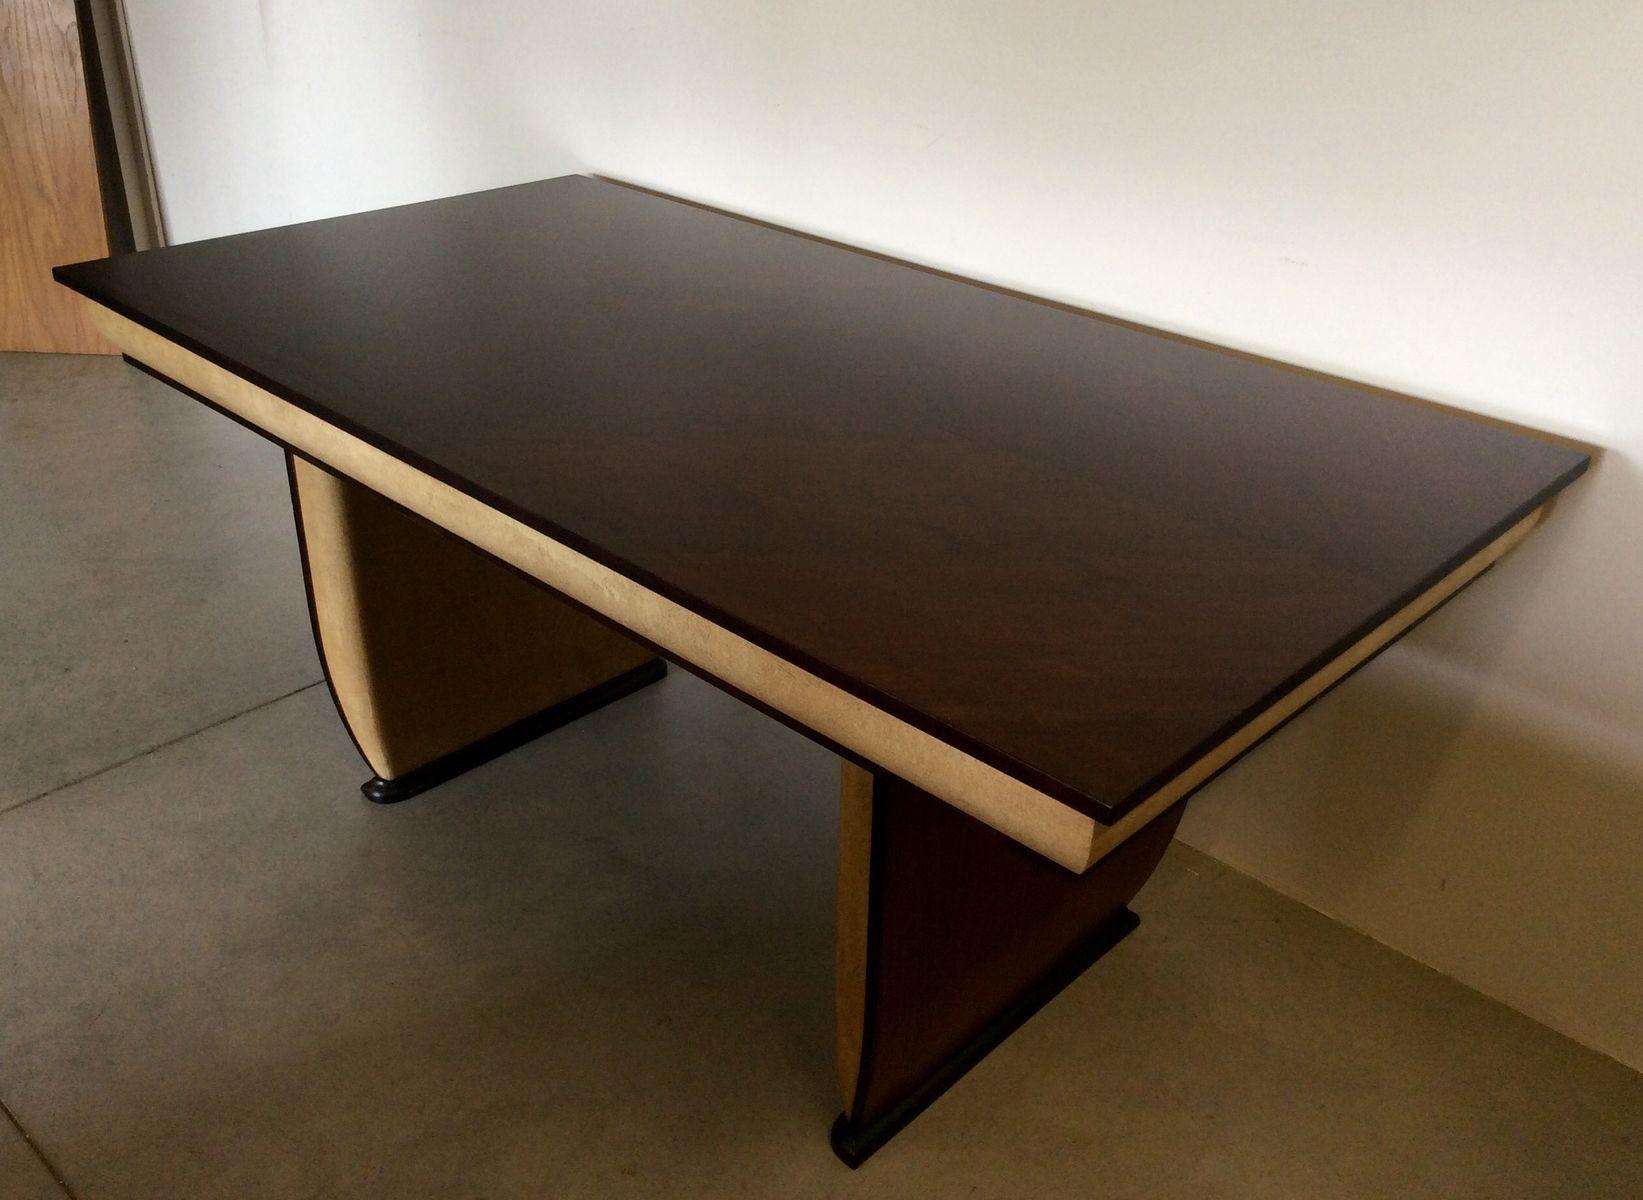 table de salle manger vintage italie en vente sur pamono. Black Bedroom Furniture Sets. Home Design Ideas